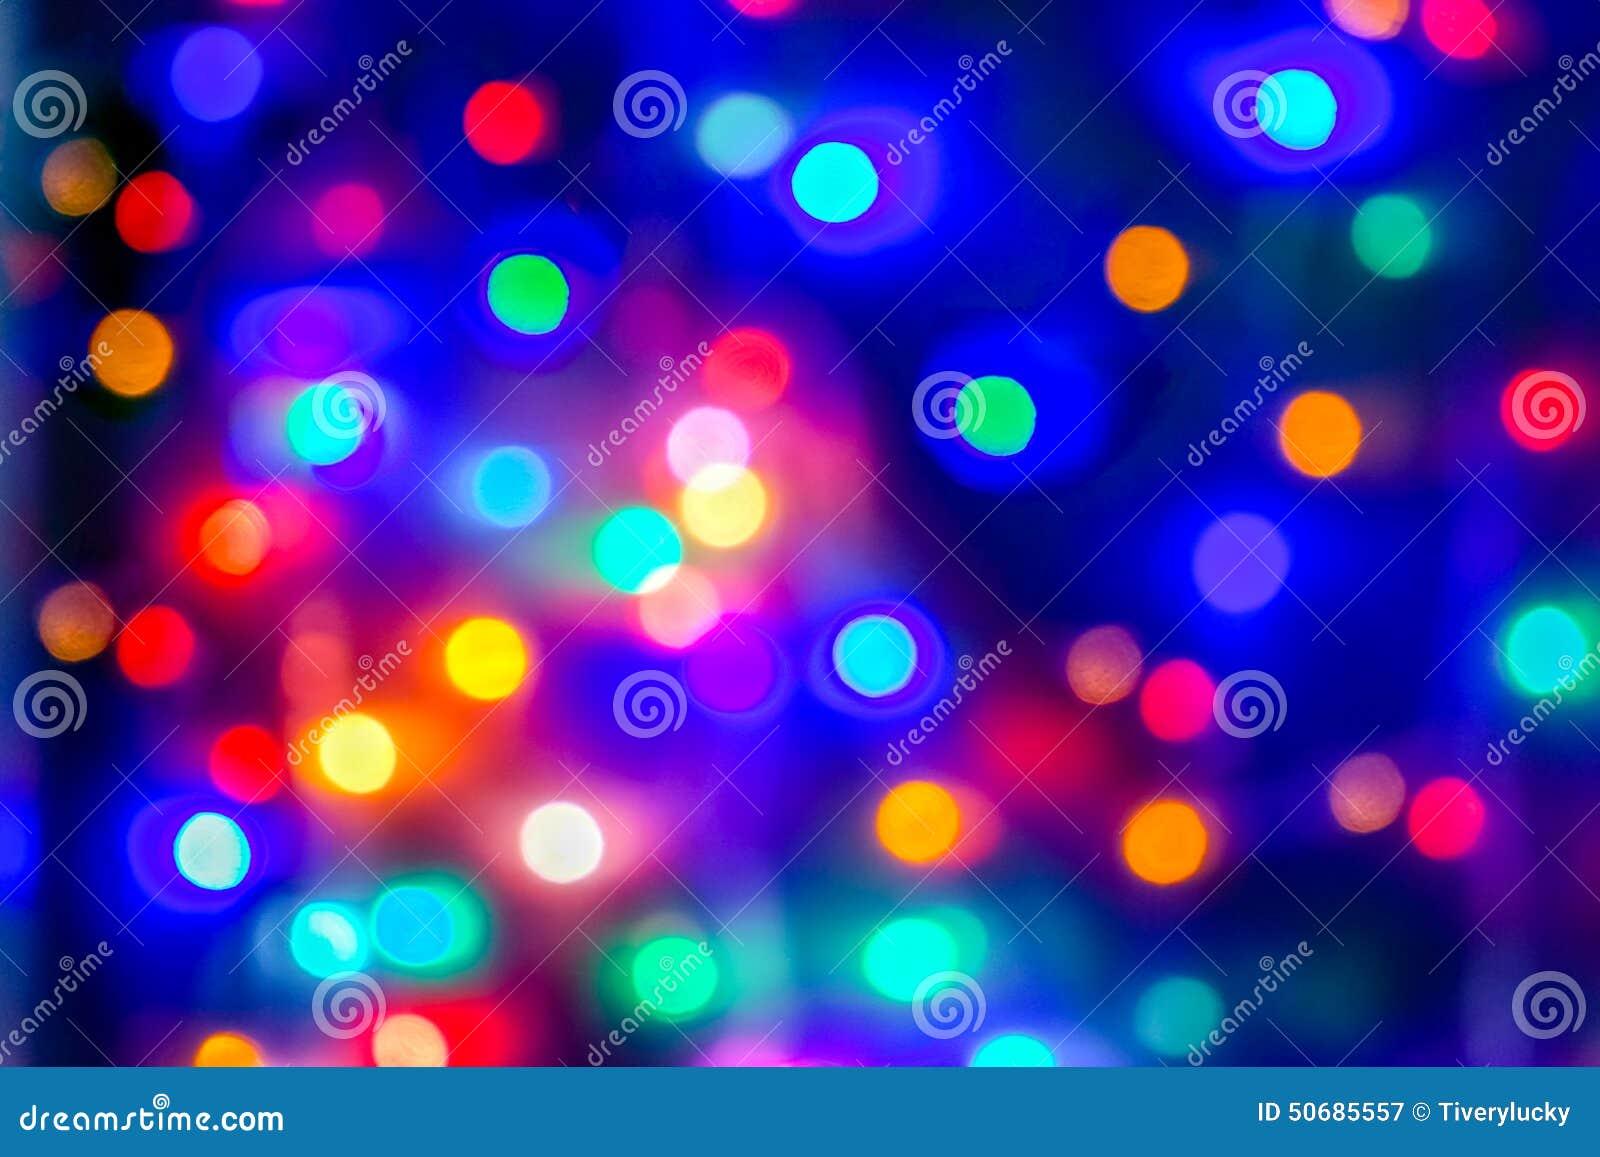 Download 抽象背景 库存图片. 图片 包括有 发光, 节假日, 橙色, 有福地, 五颜六色, 背包, 小点, 对象 - 50685557